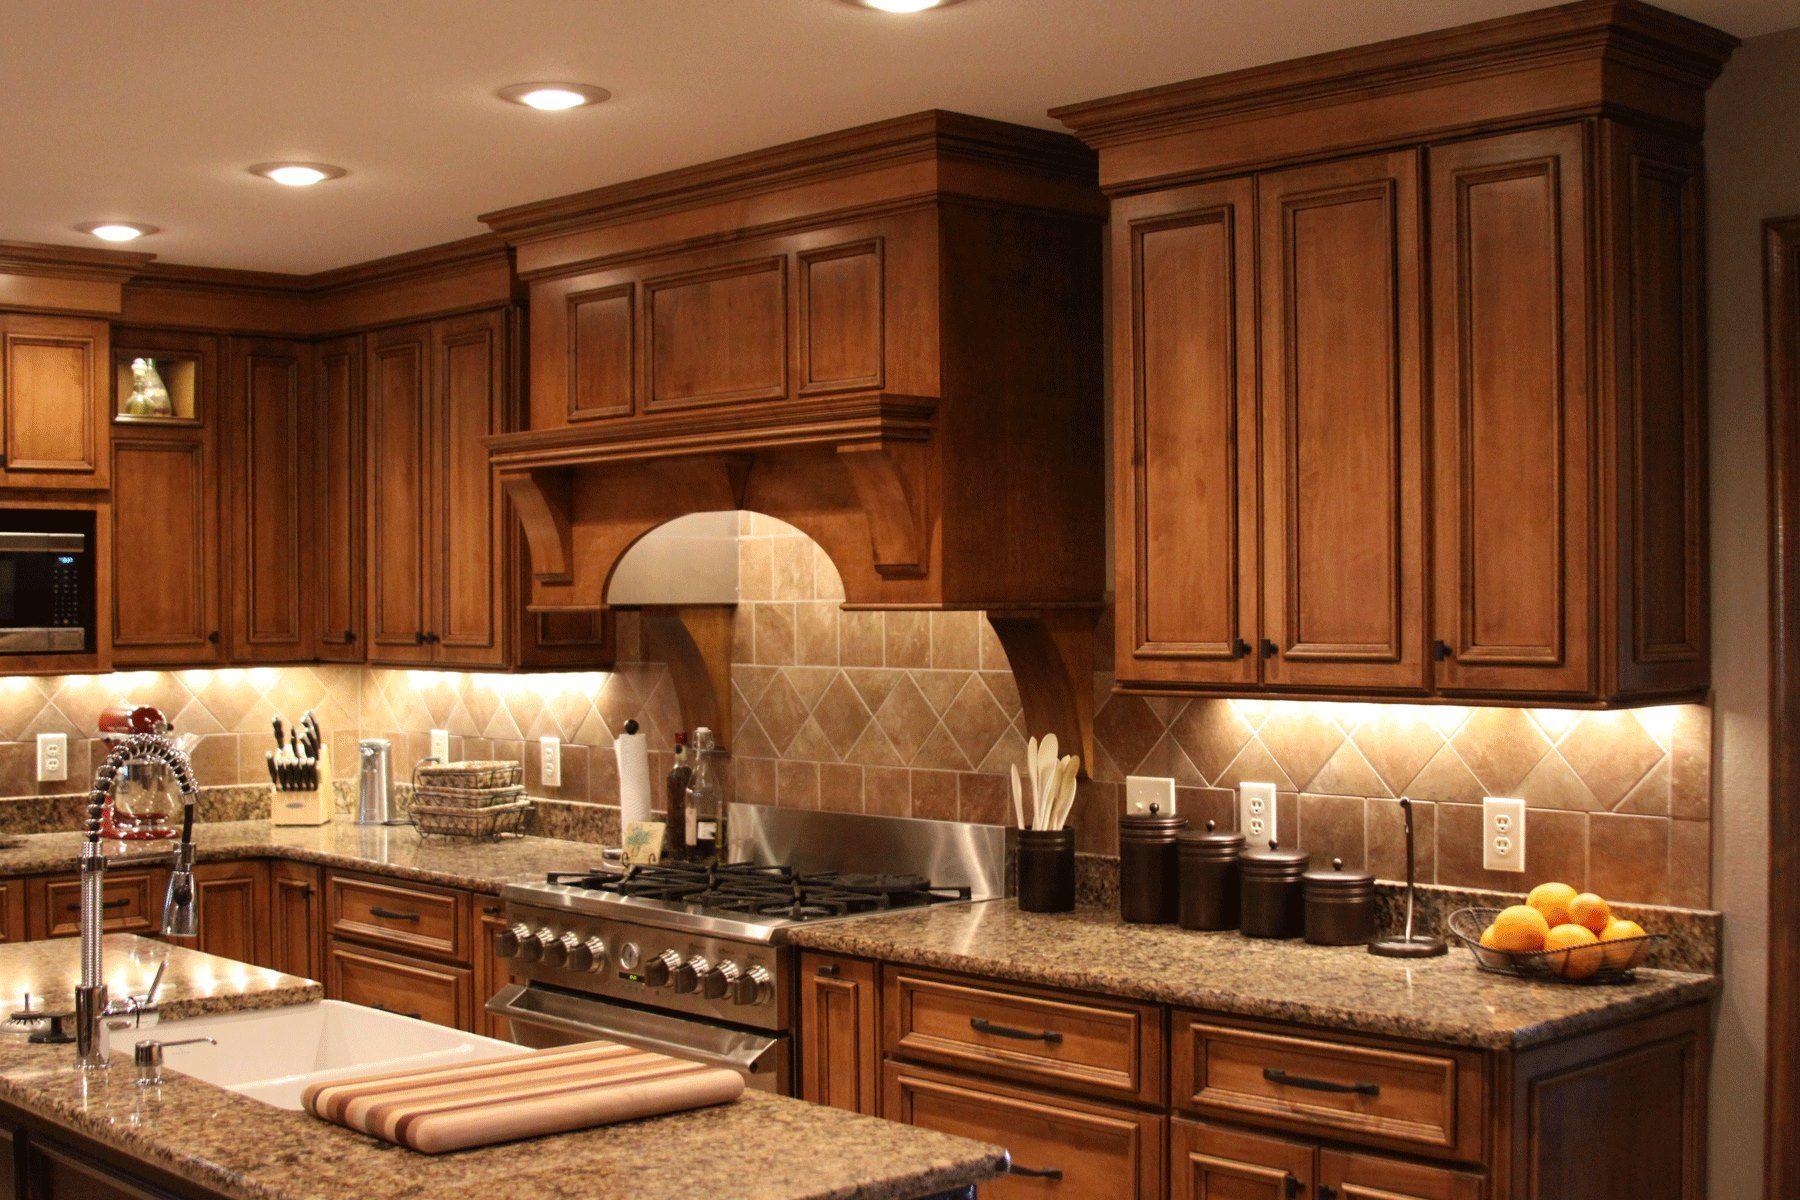 robison associates kitchen home portfolio kitchen find this pin and more on kitchen by justcallmegie